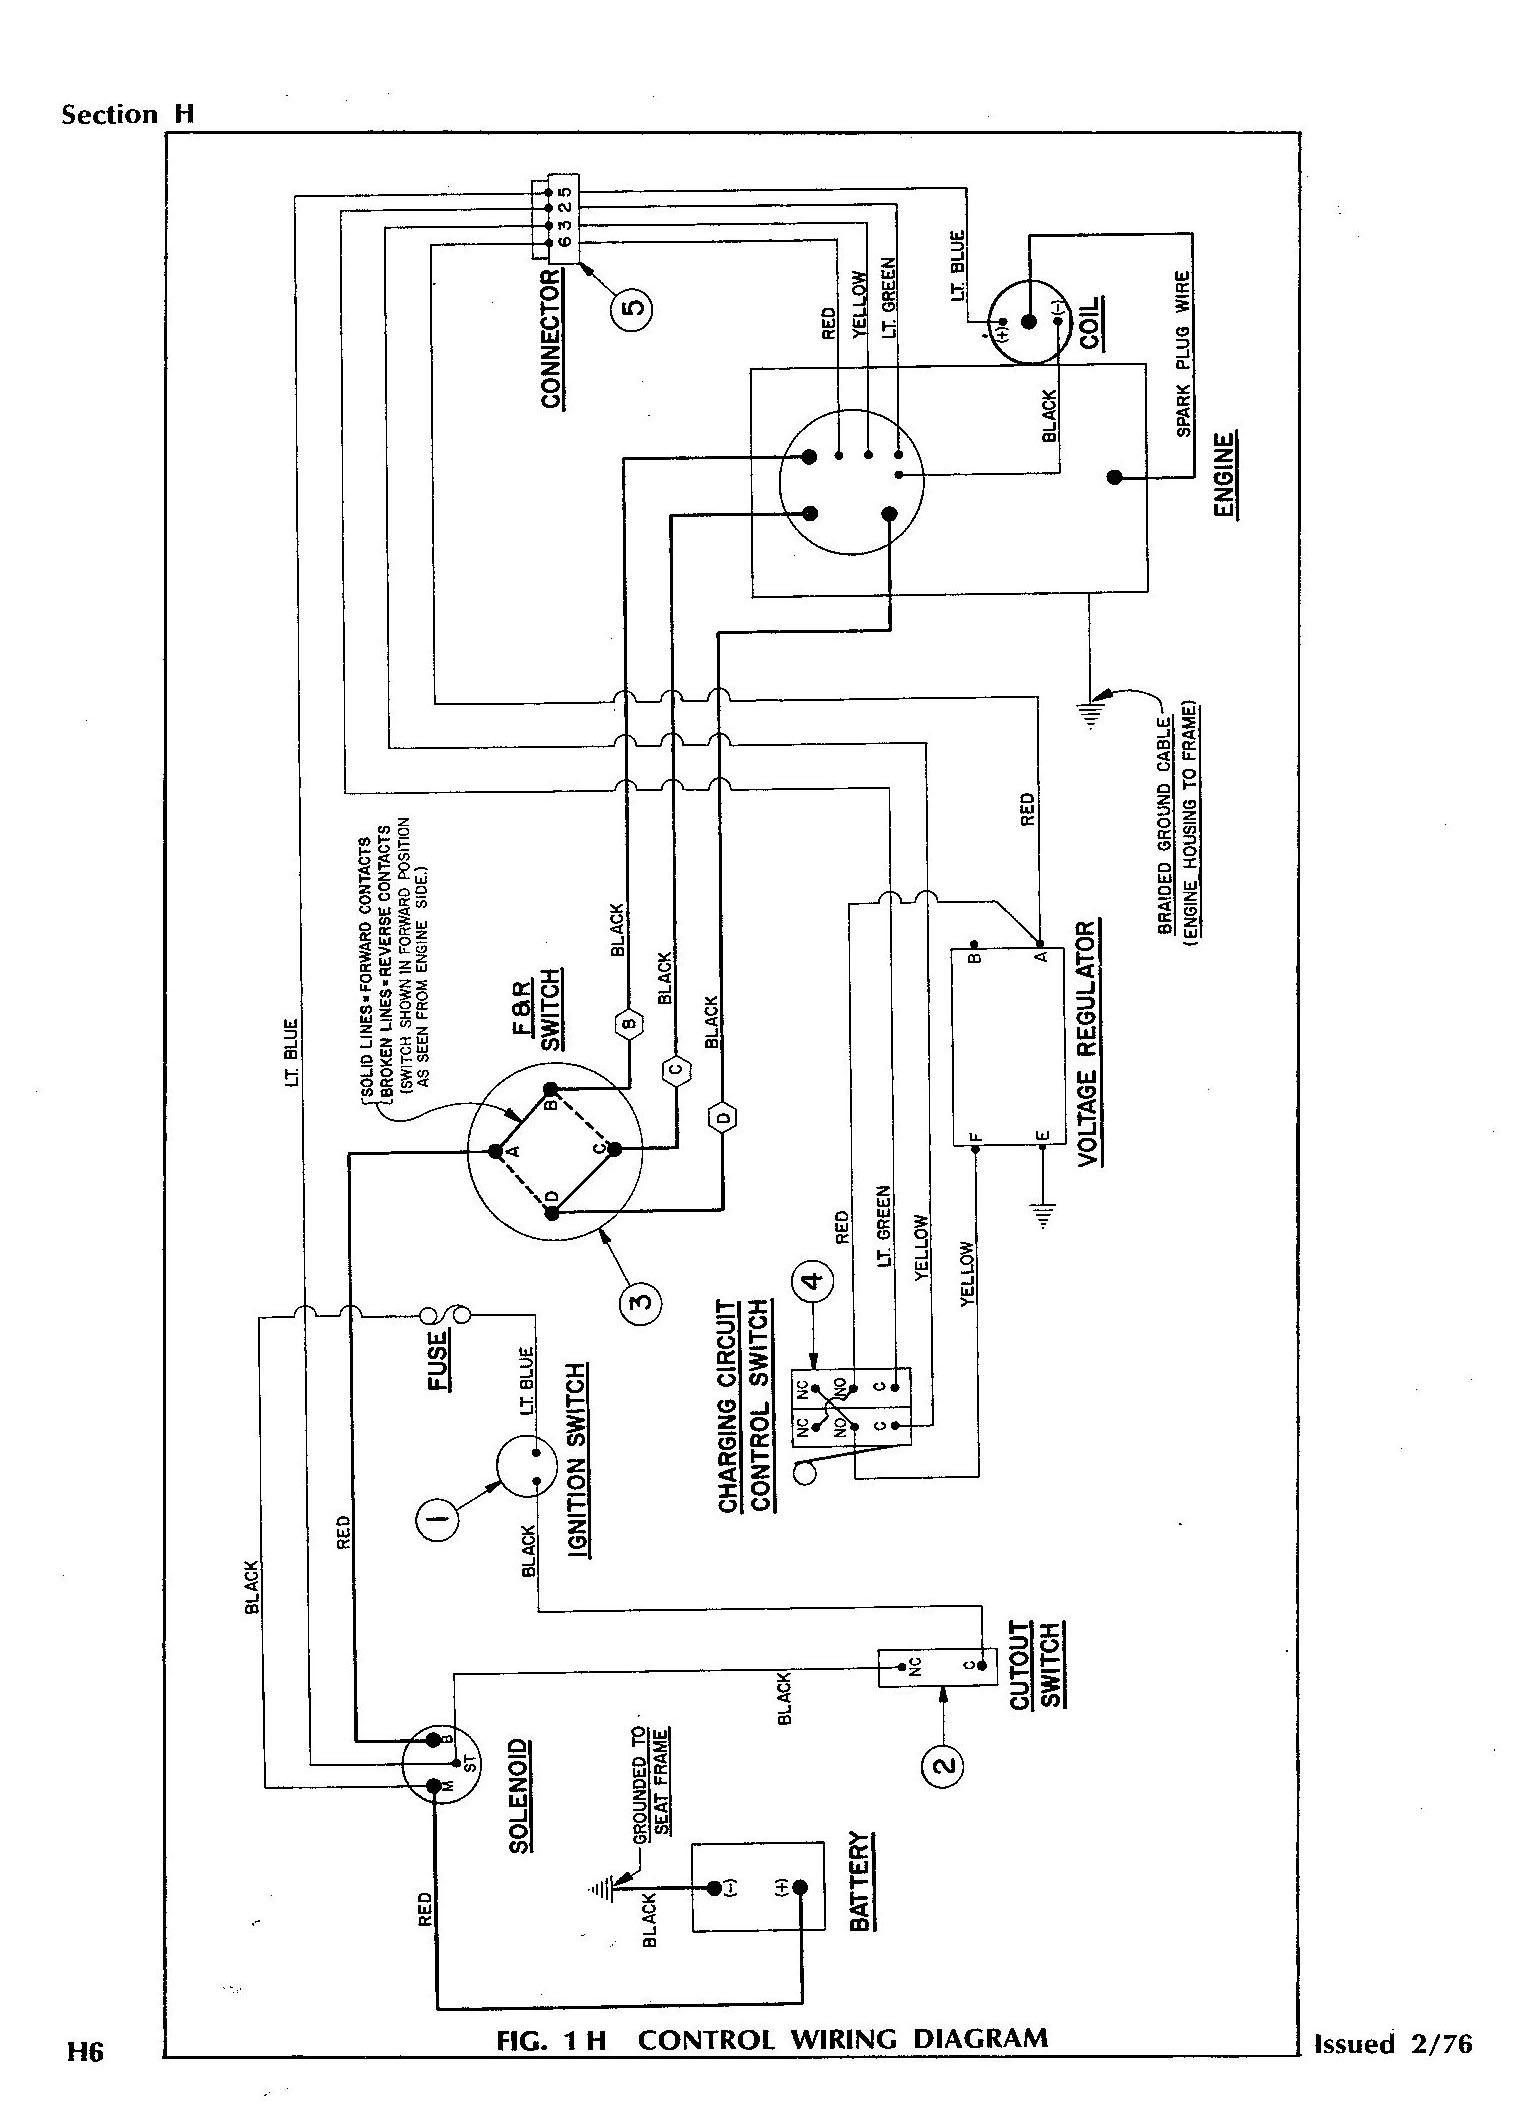 bmw mini stereo wiring diagram 2000 chevy blazer 4wd ez 20 auto electrical related with